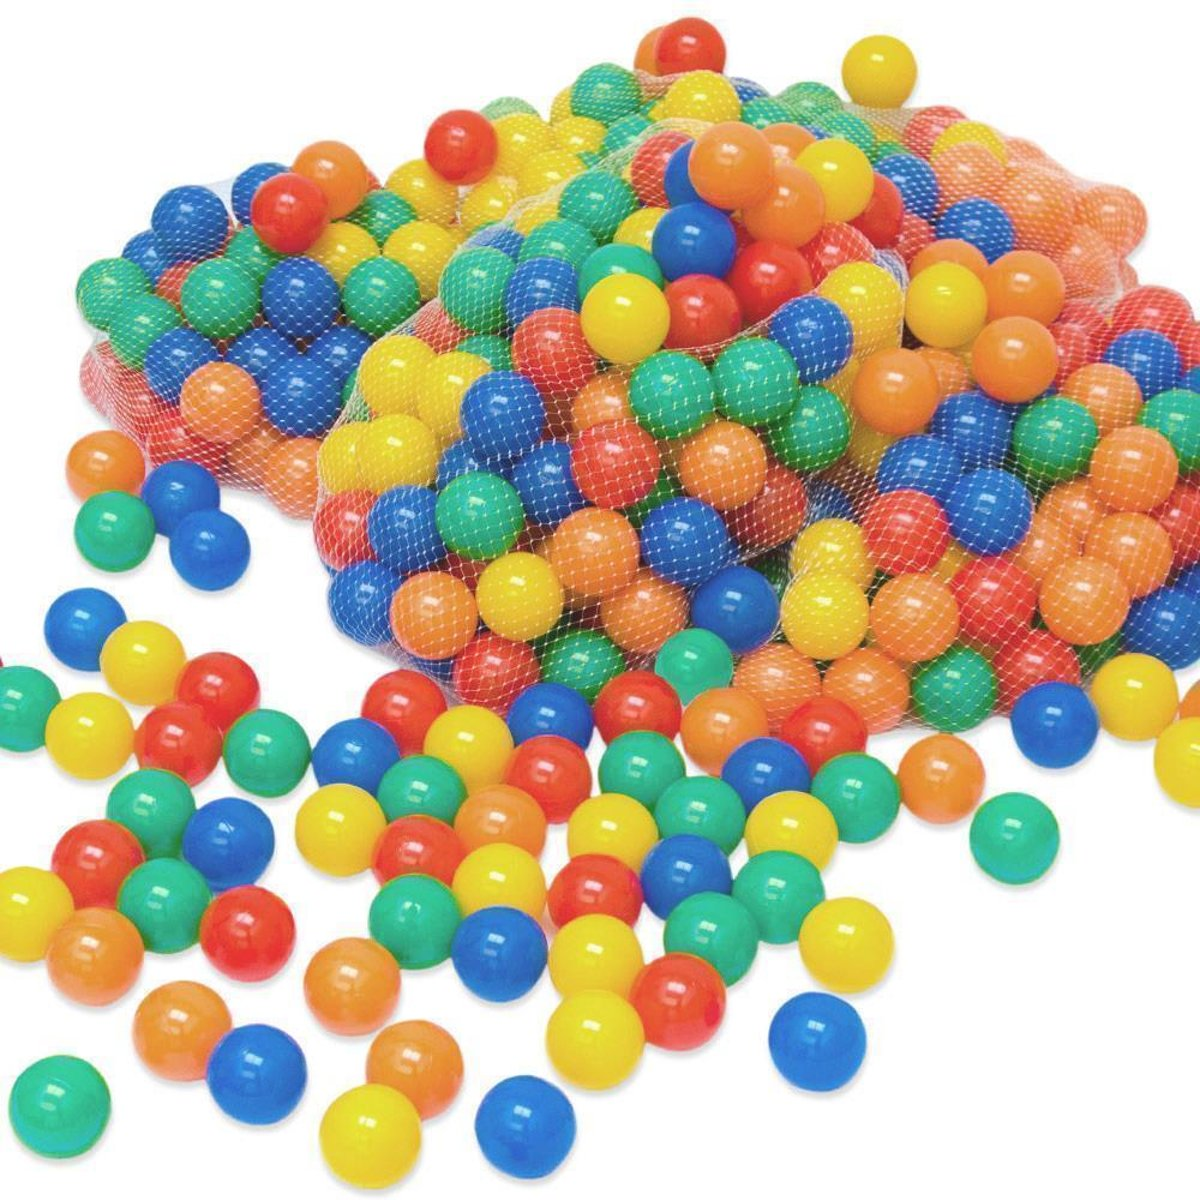 Kogelballen 6 cm diameter 700 ballen